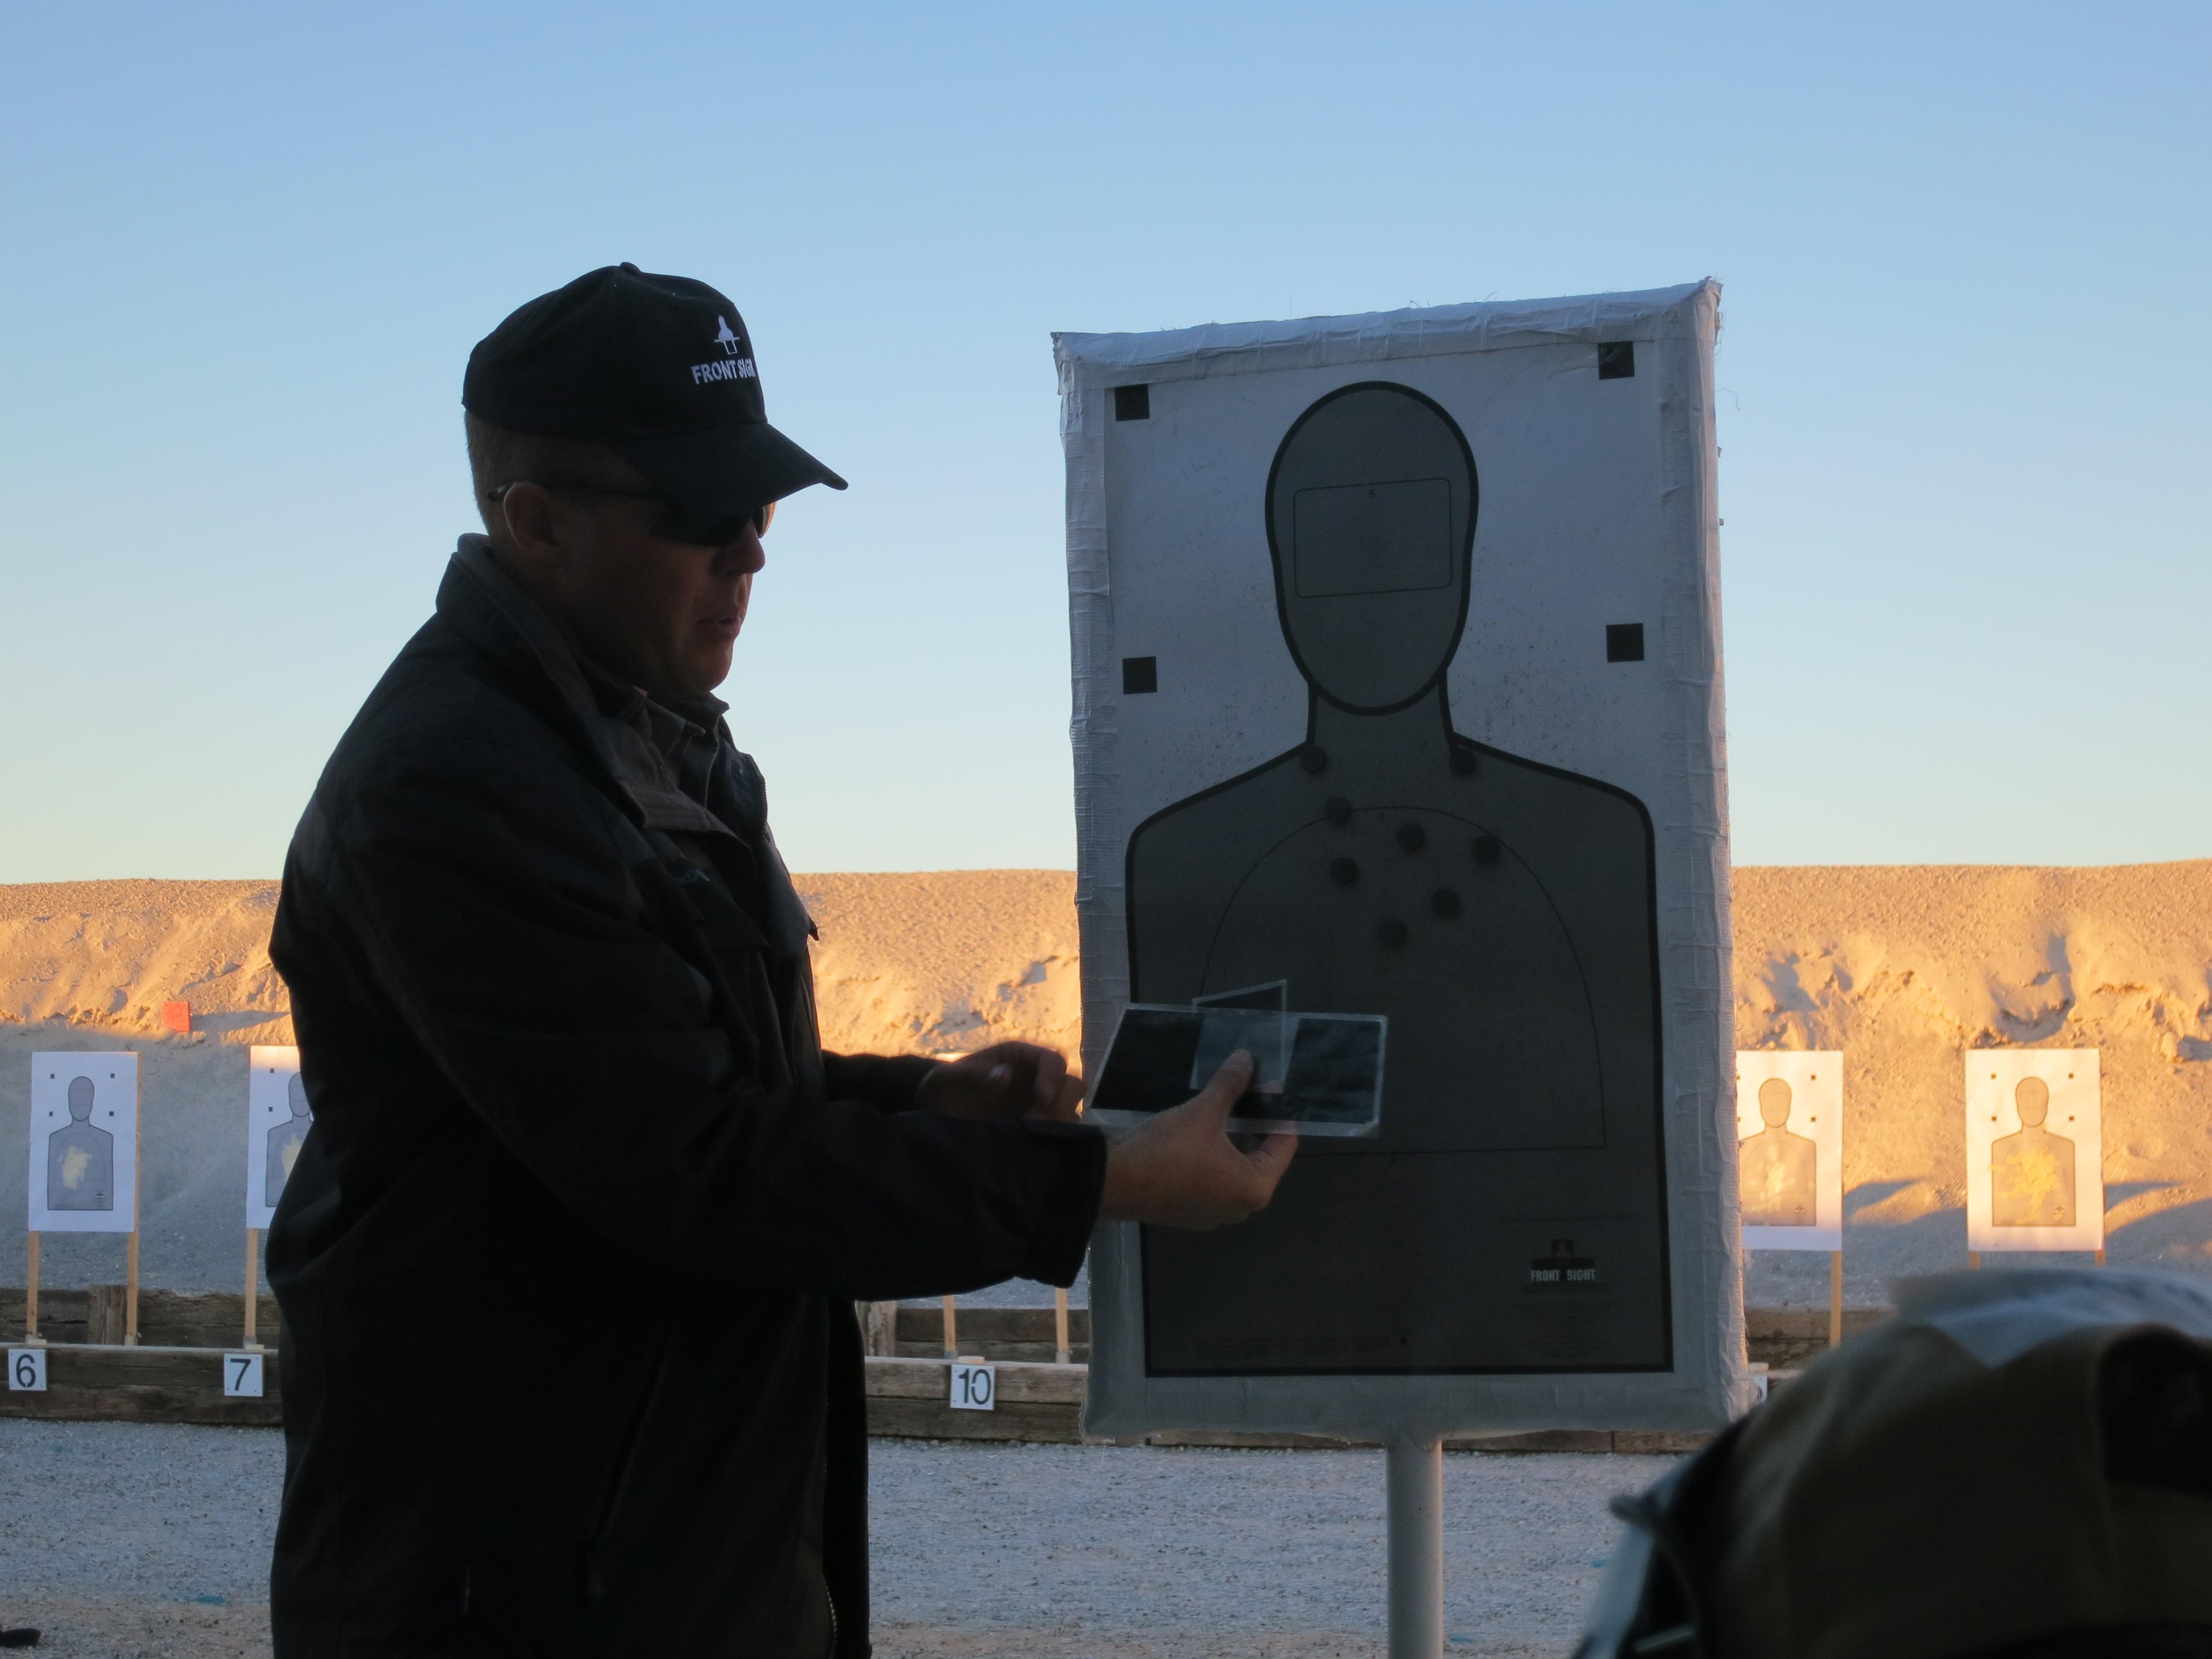 Frontsight Handgun Training